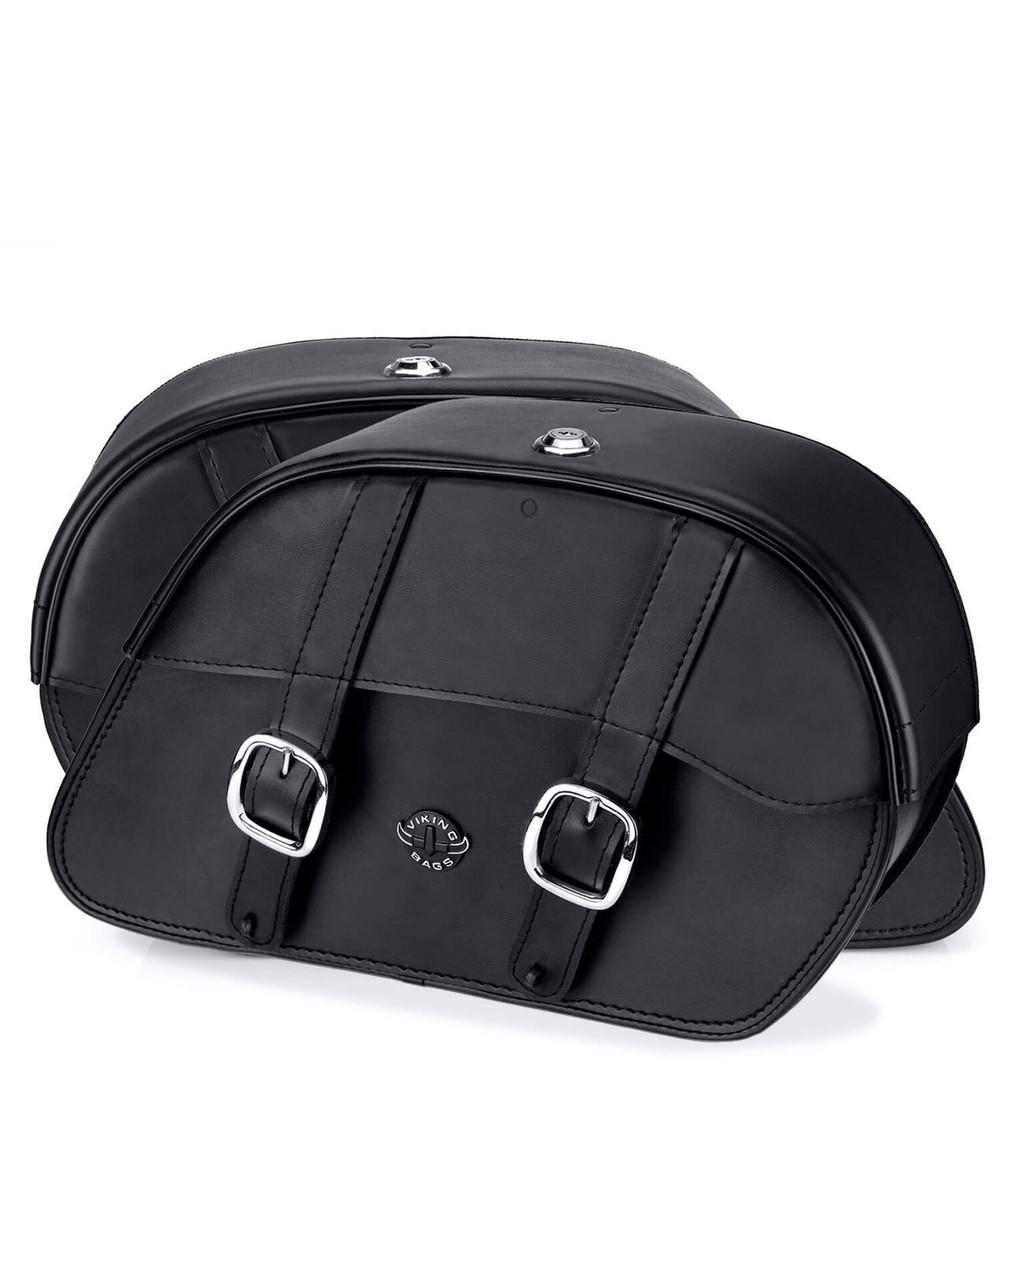 Kawasaki Eliminator 125 Shock Cutout Slanted Large Motorcycle Saddlebags Both Bags View